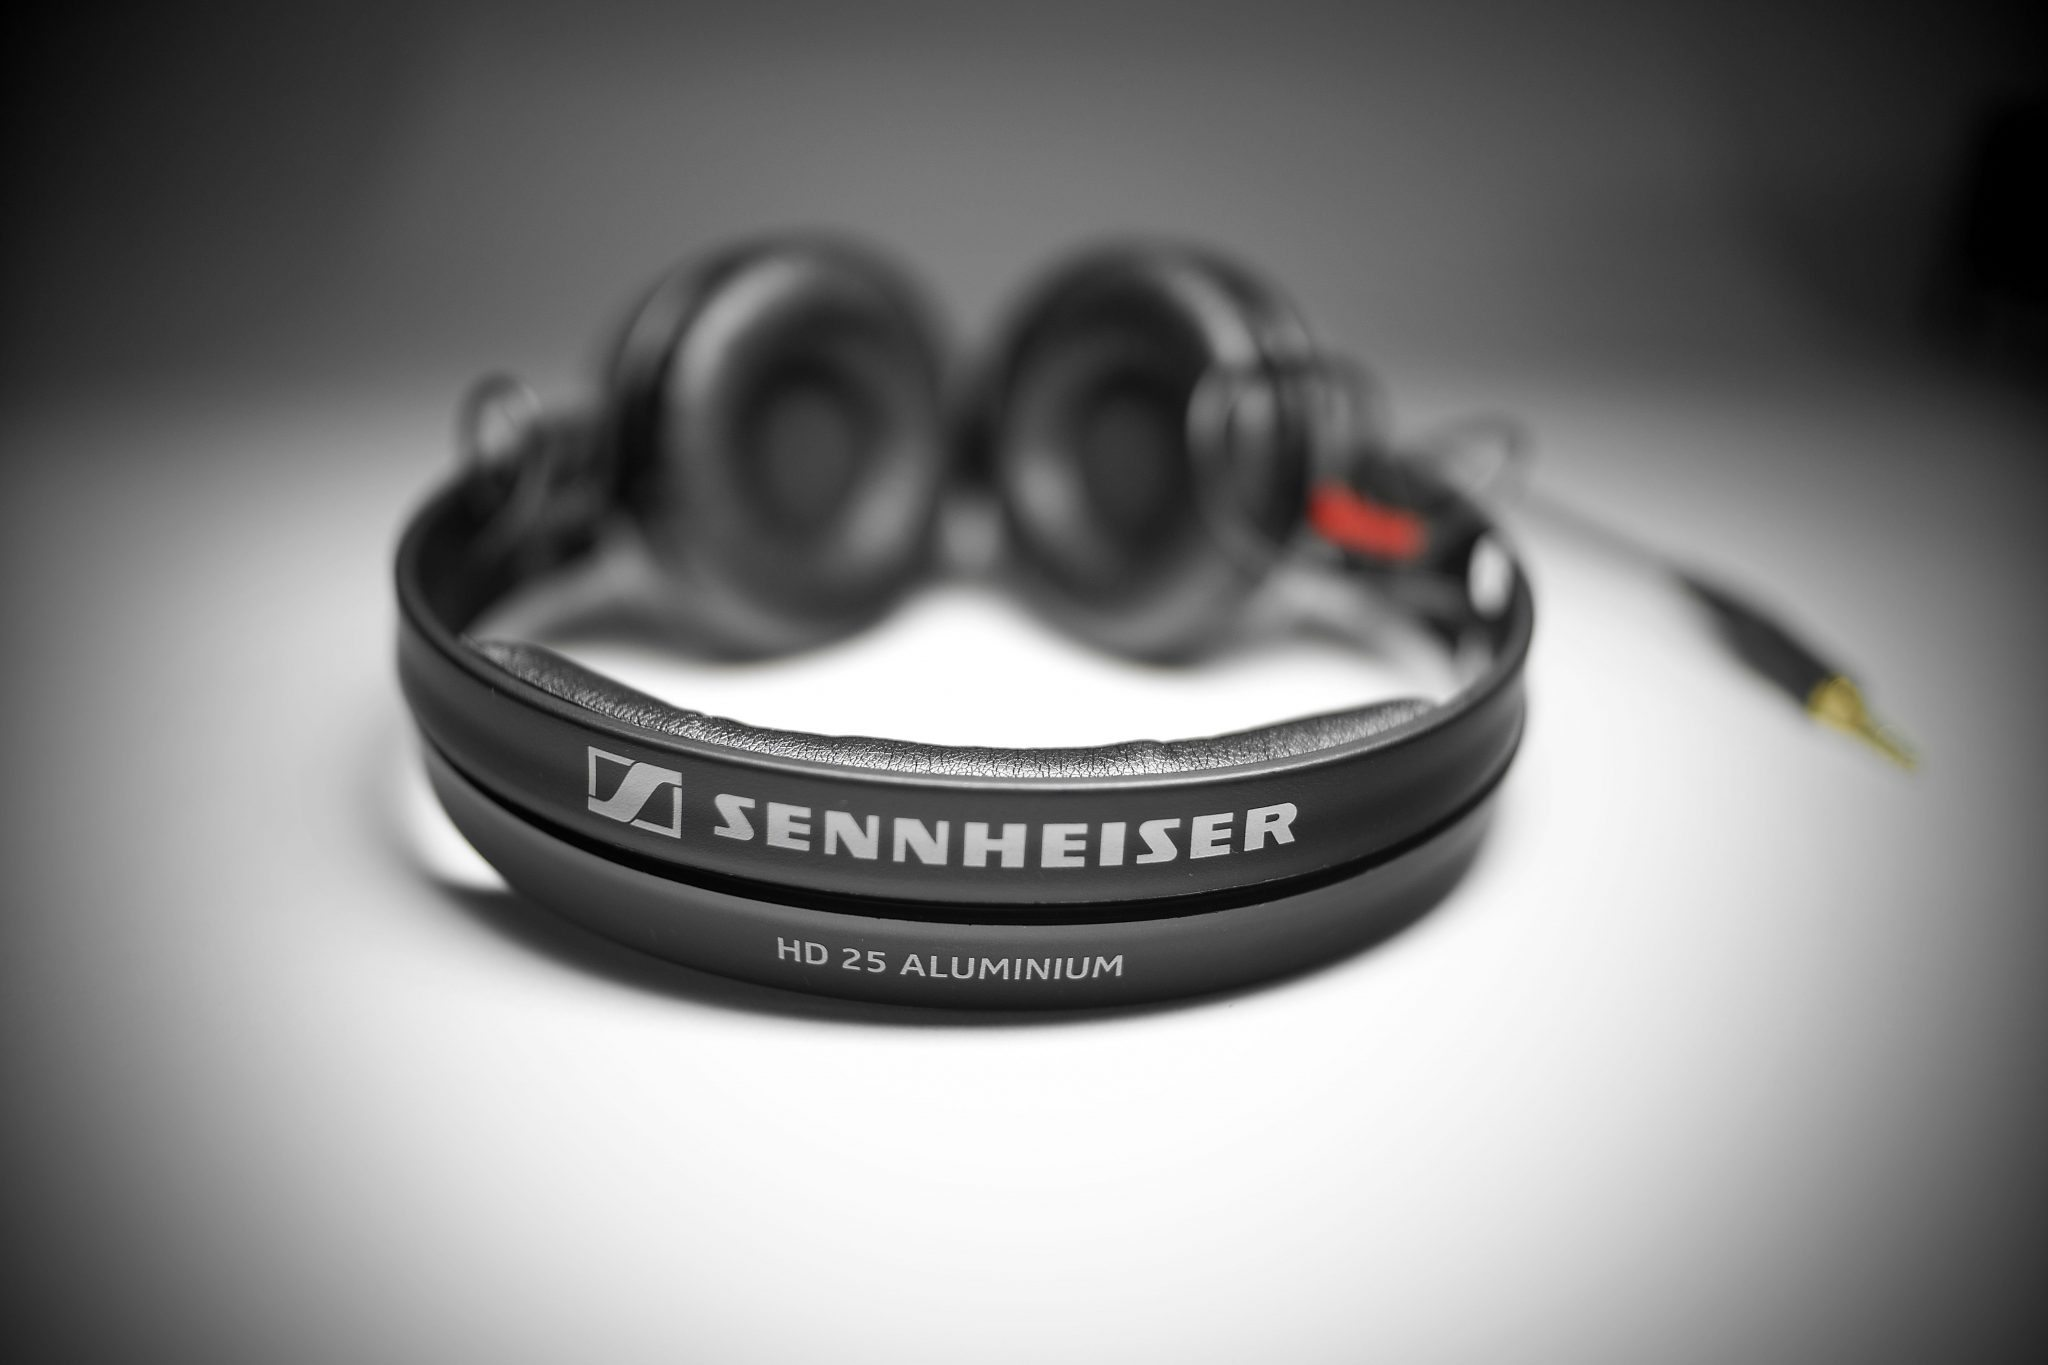 unboxing sennheiser hd 25 aluminium dj headphones djworx. Black Bedroom Furniture Sets. Home Design Ideas